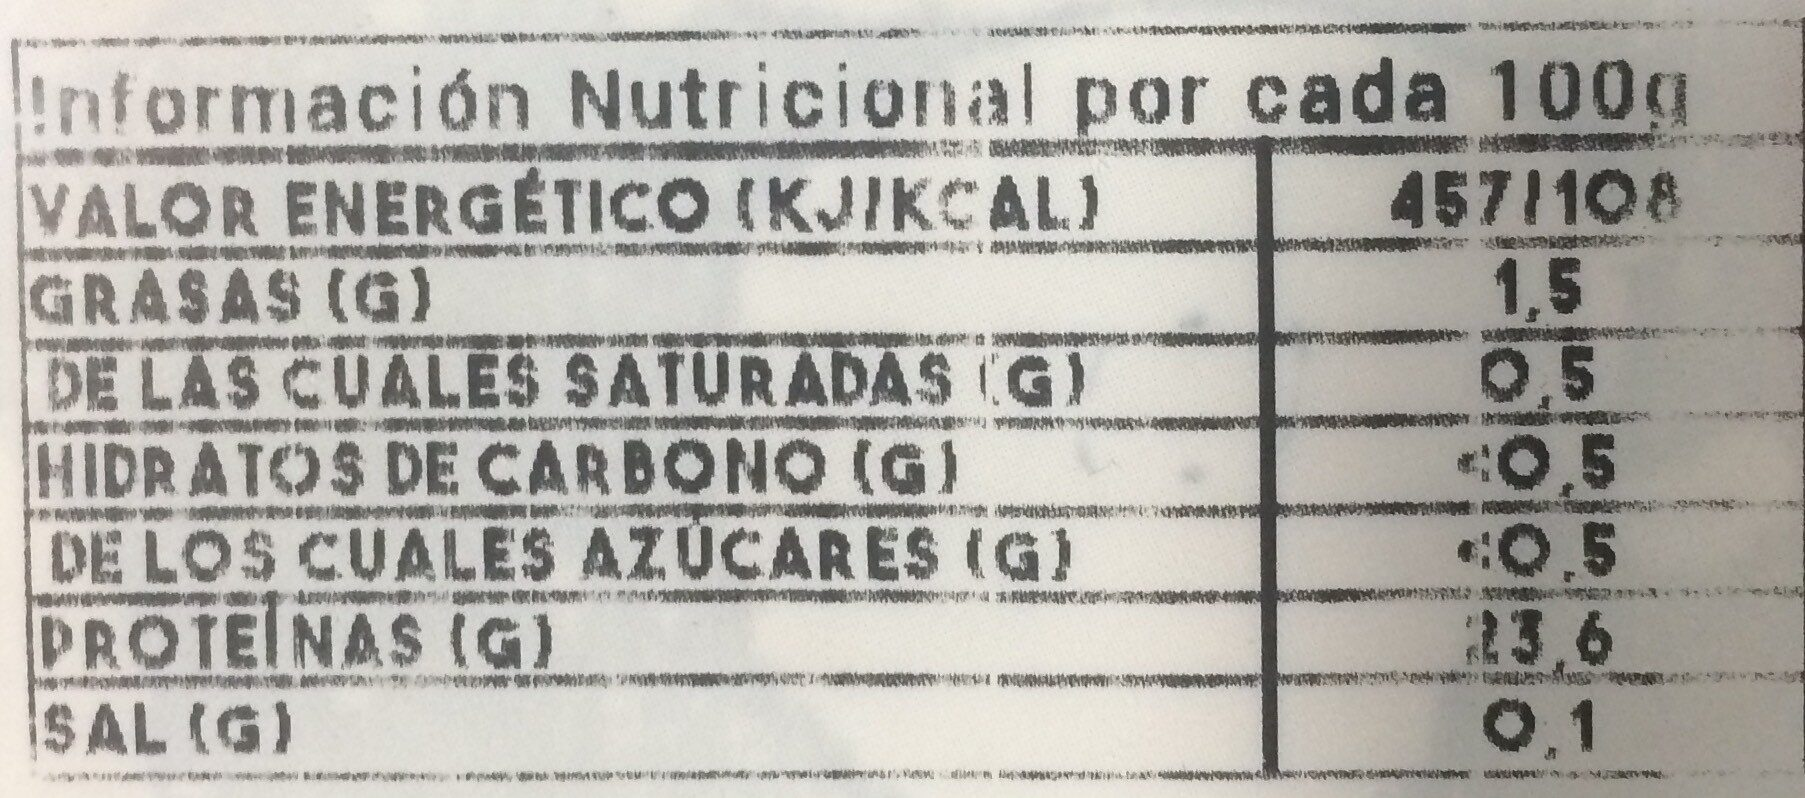 Pollo línea sabor - Información nutricional